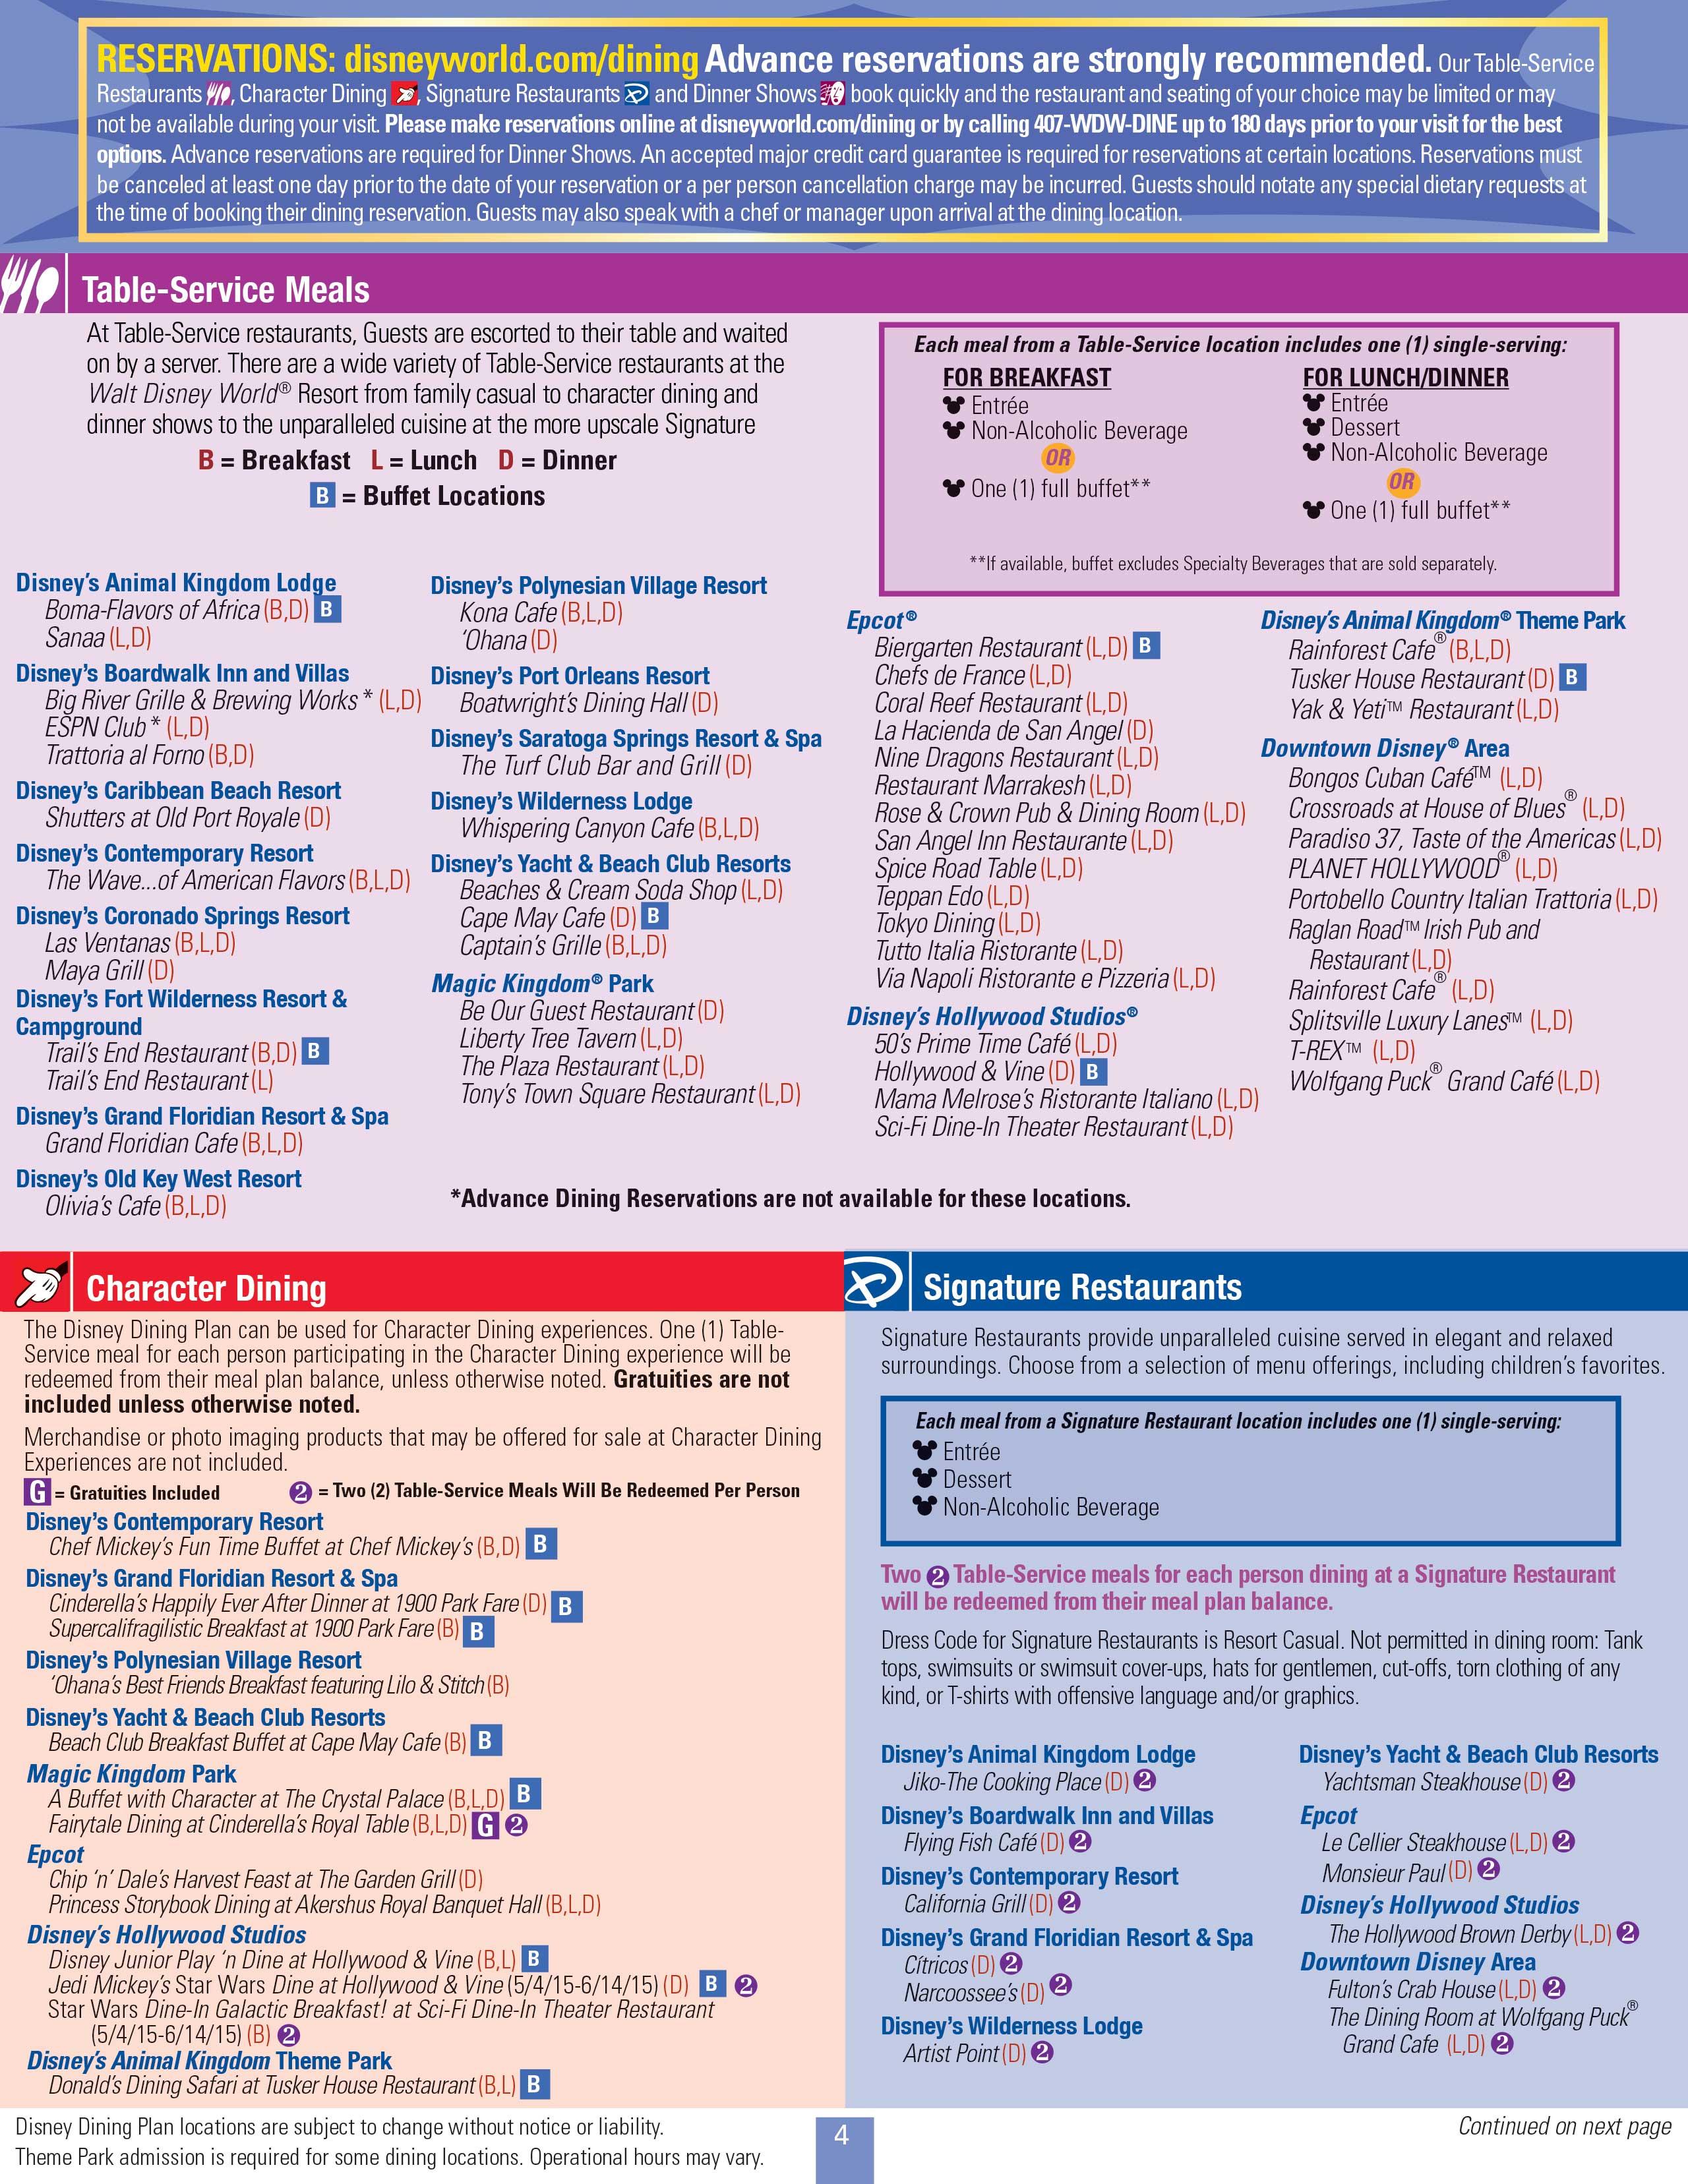 2015 disney dining plan brochures photo 6 of 30 2015 disney dining plan brochures biocorpaavc Choice Image